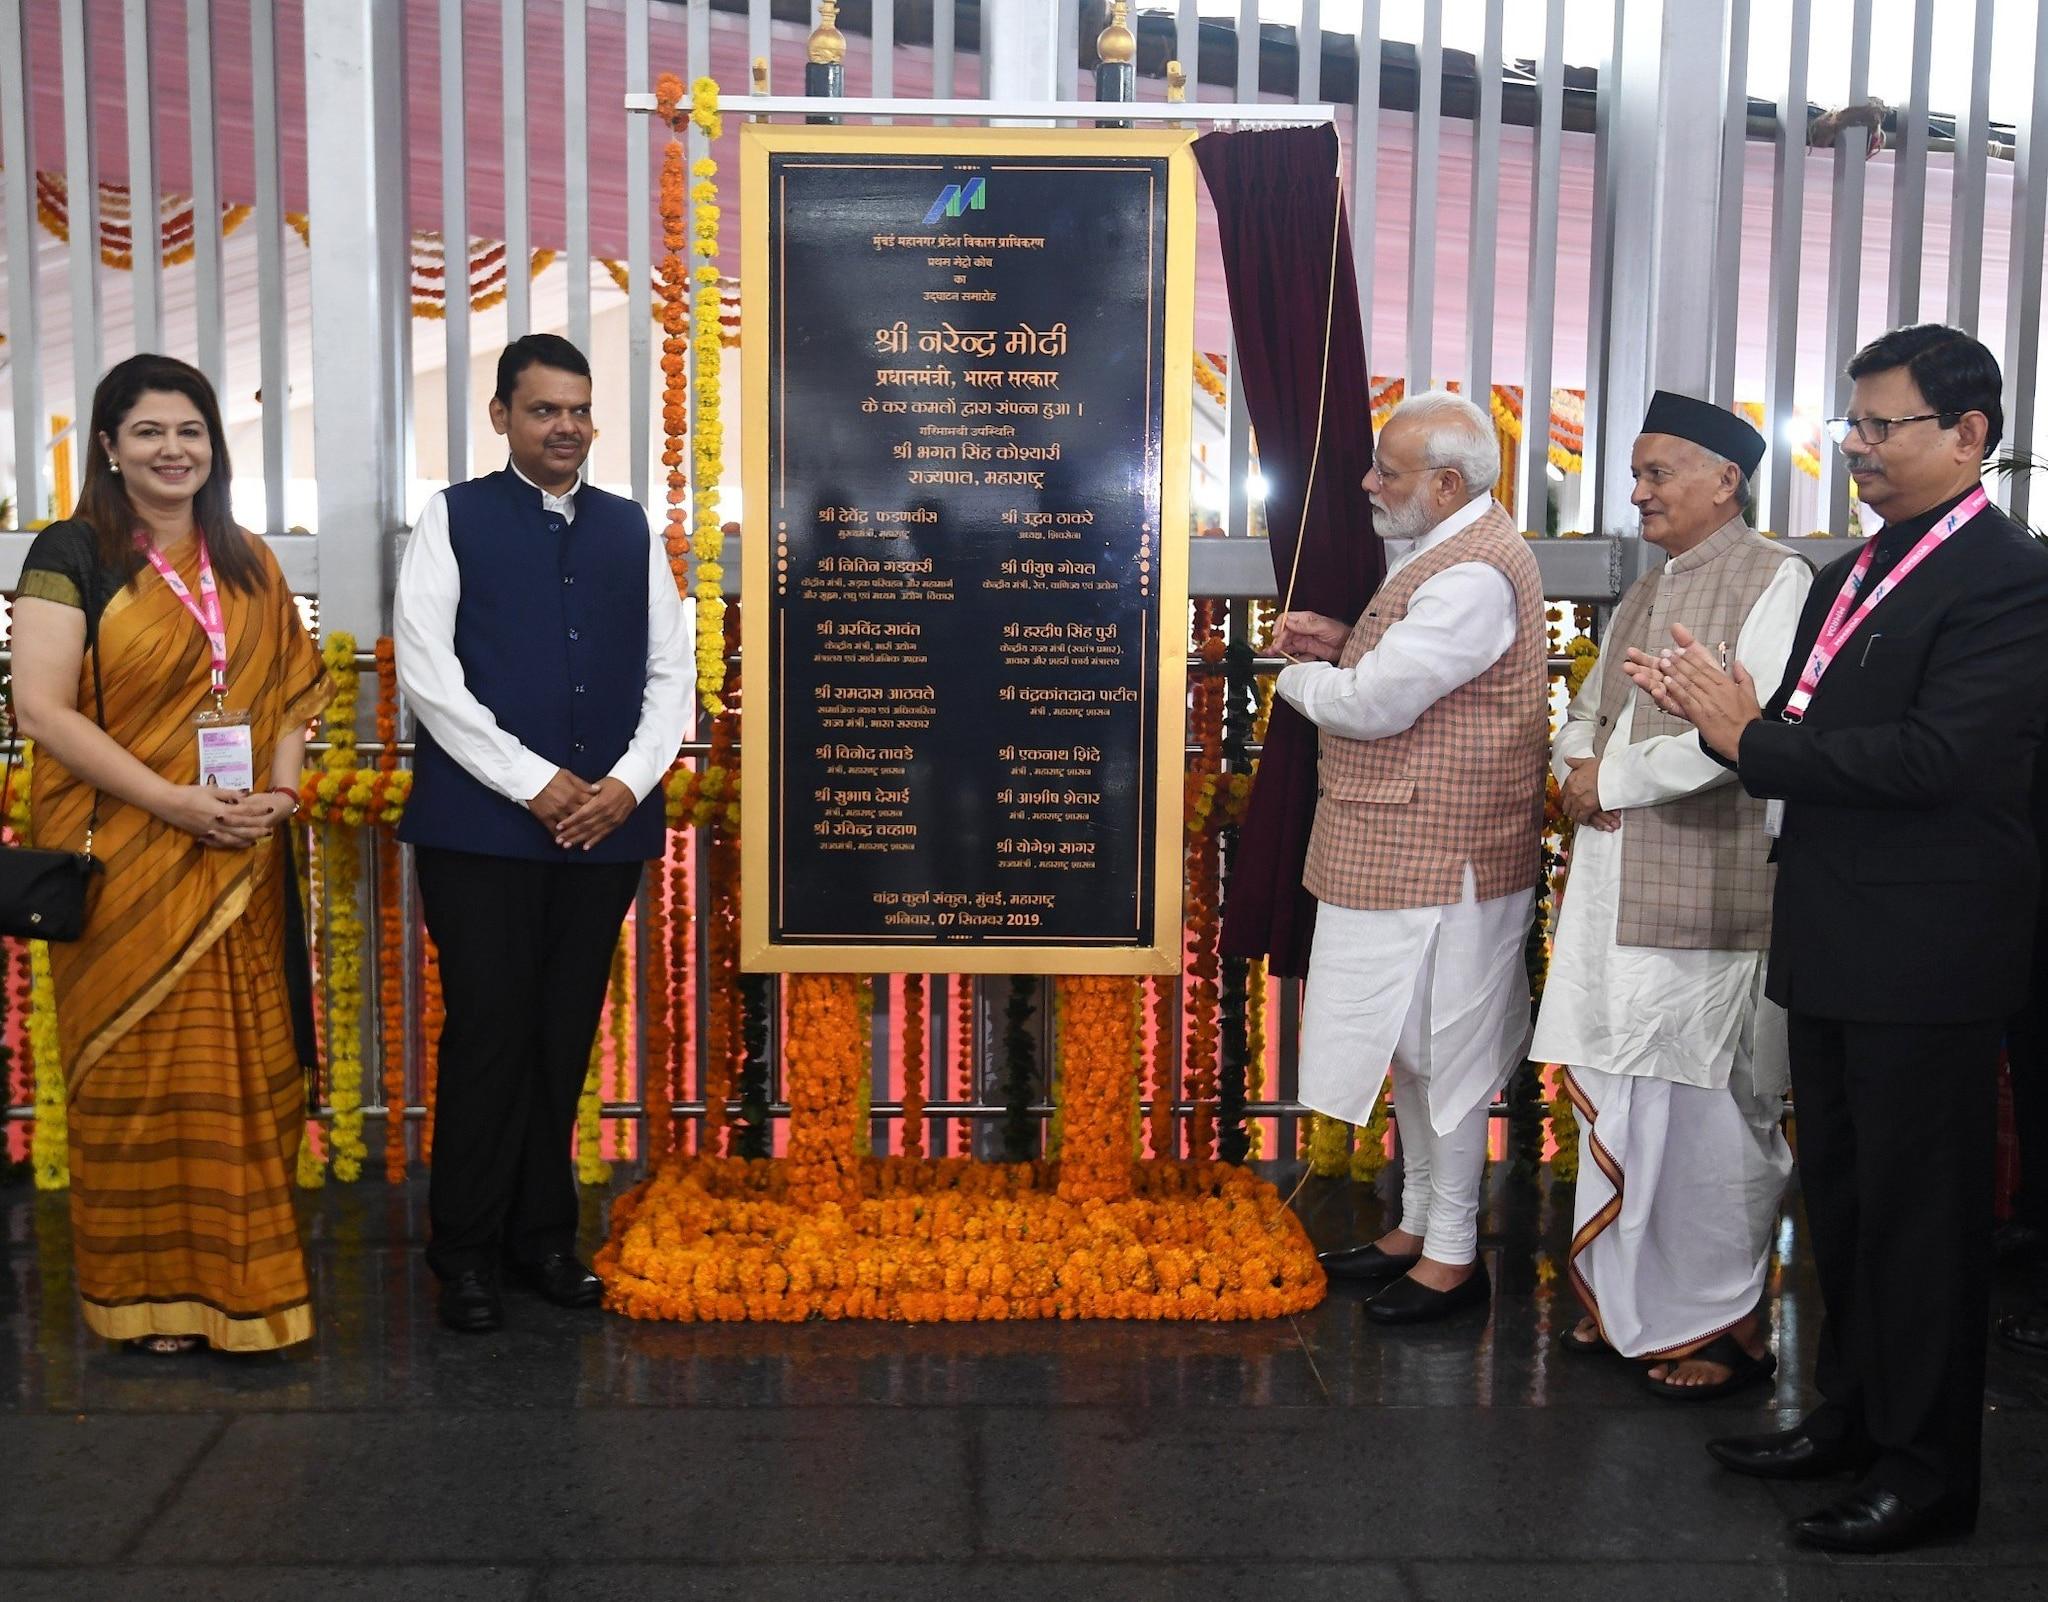 Prime Minister Narendra Modi inaugurates a state-of-the-art metro coach, the first metro coach under Make in India, in Mumbai. Photo credit: PIB India)